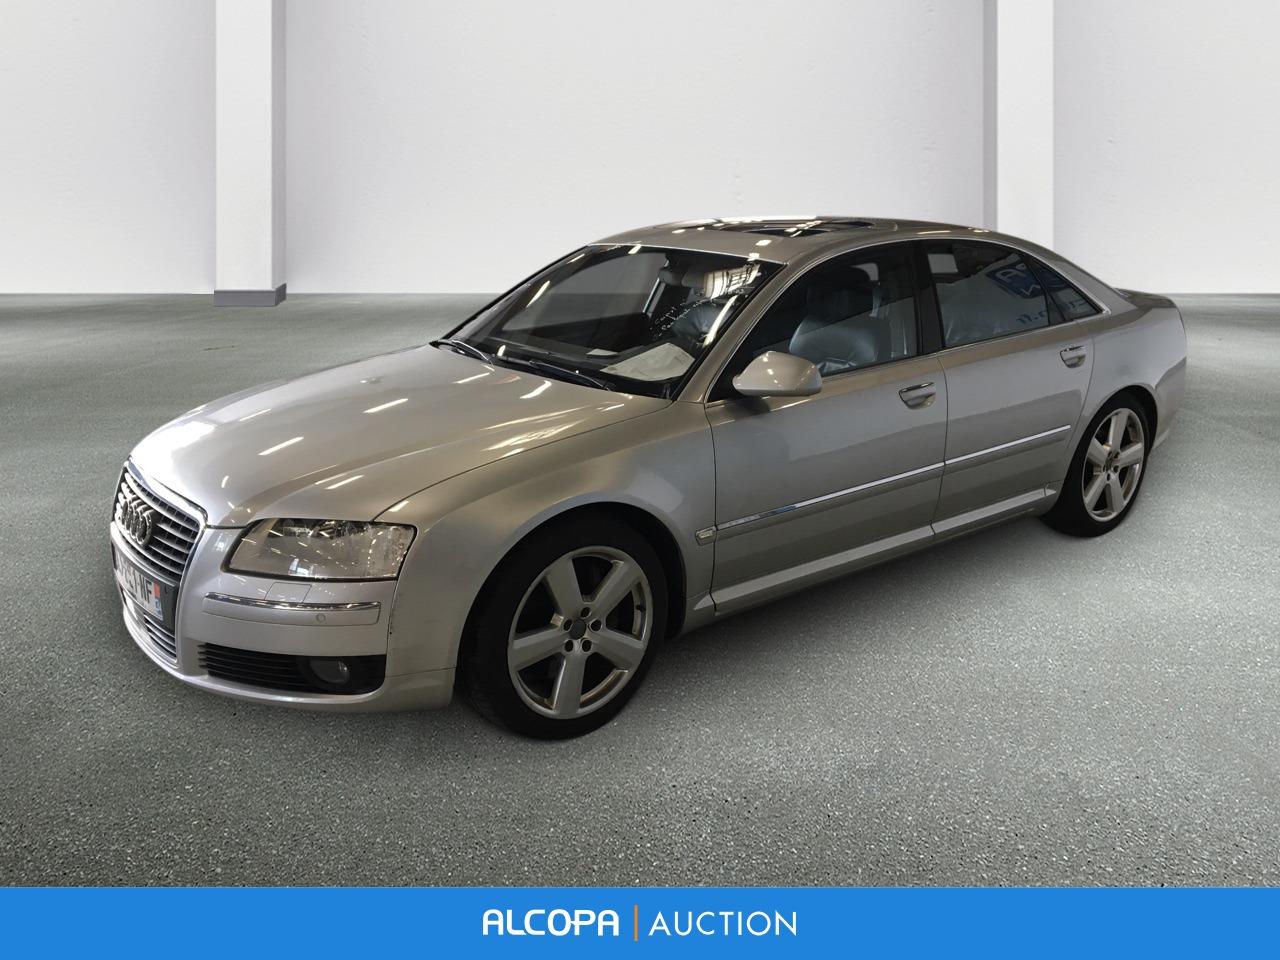 Kelebihan Audi A8 4.2 V8 Tangguh